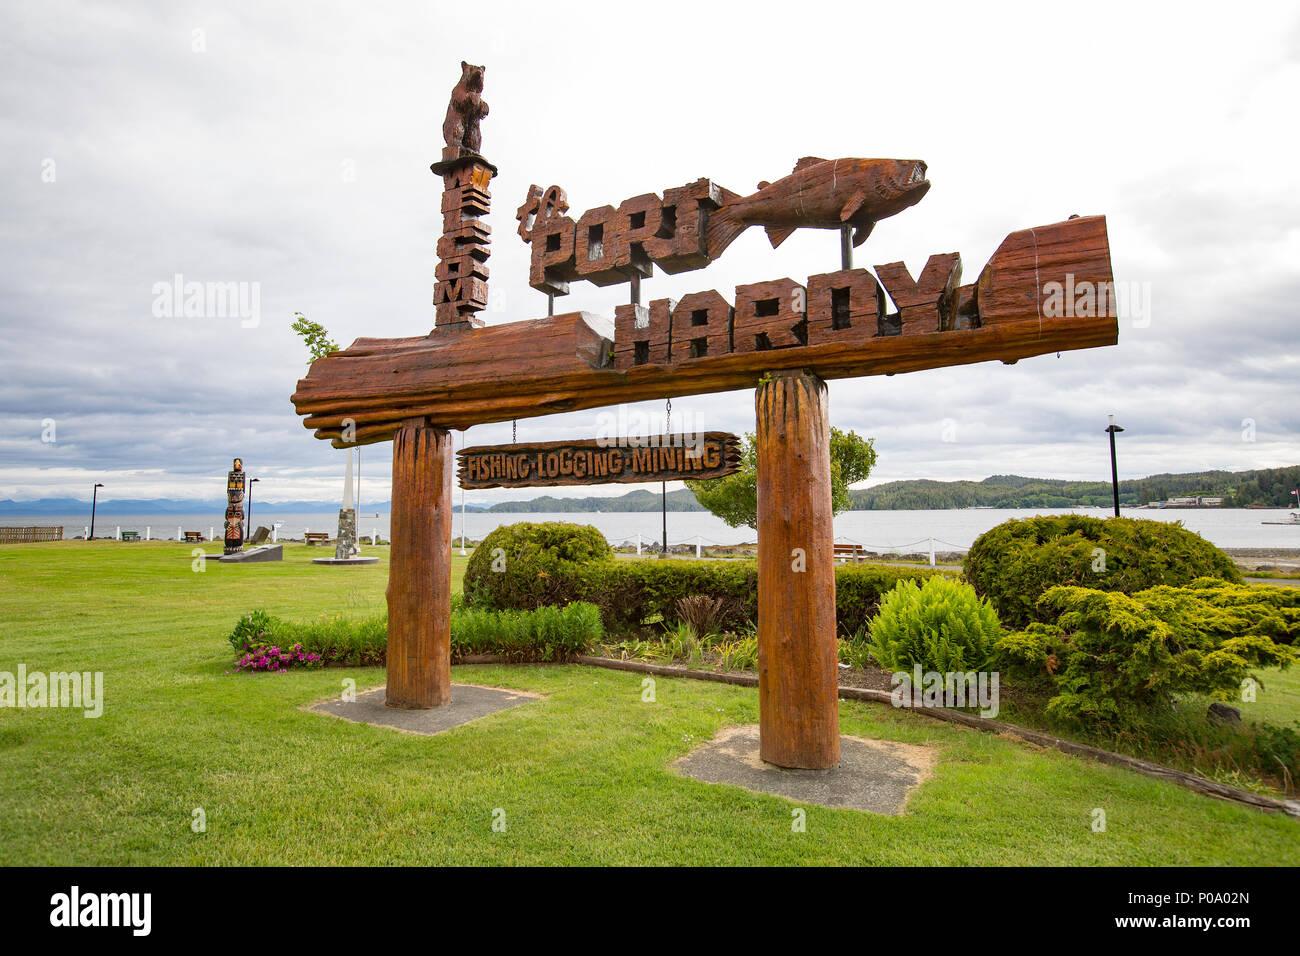 Port Hardy sign, Vancouver Island, British Columbia, Canada - Stock Image